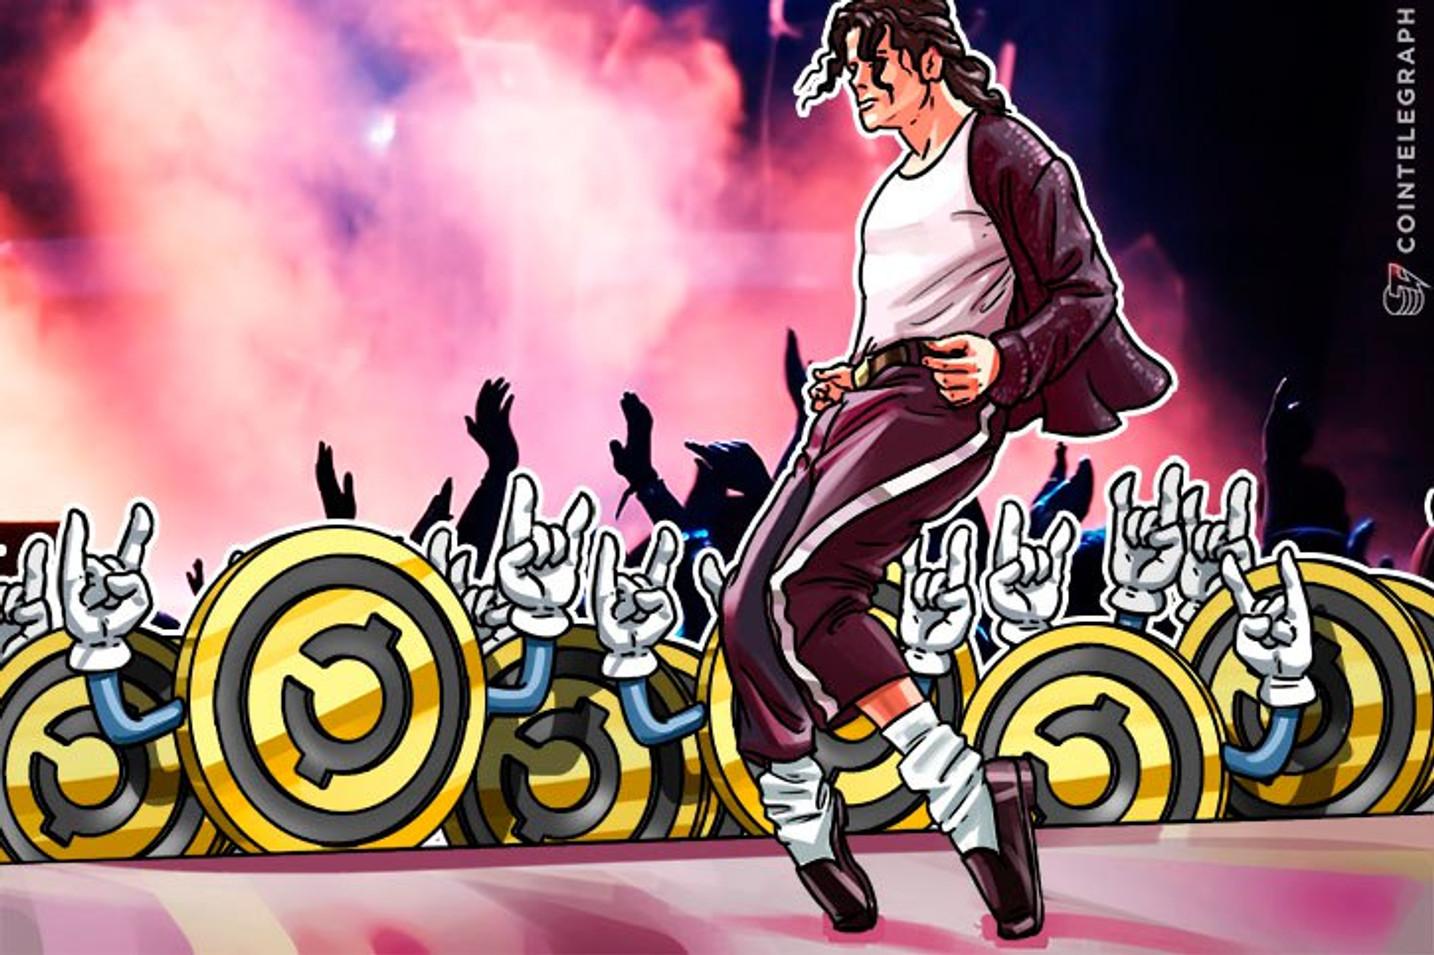 Blockchain Best for Creative Artists Seeking Recognition